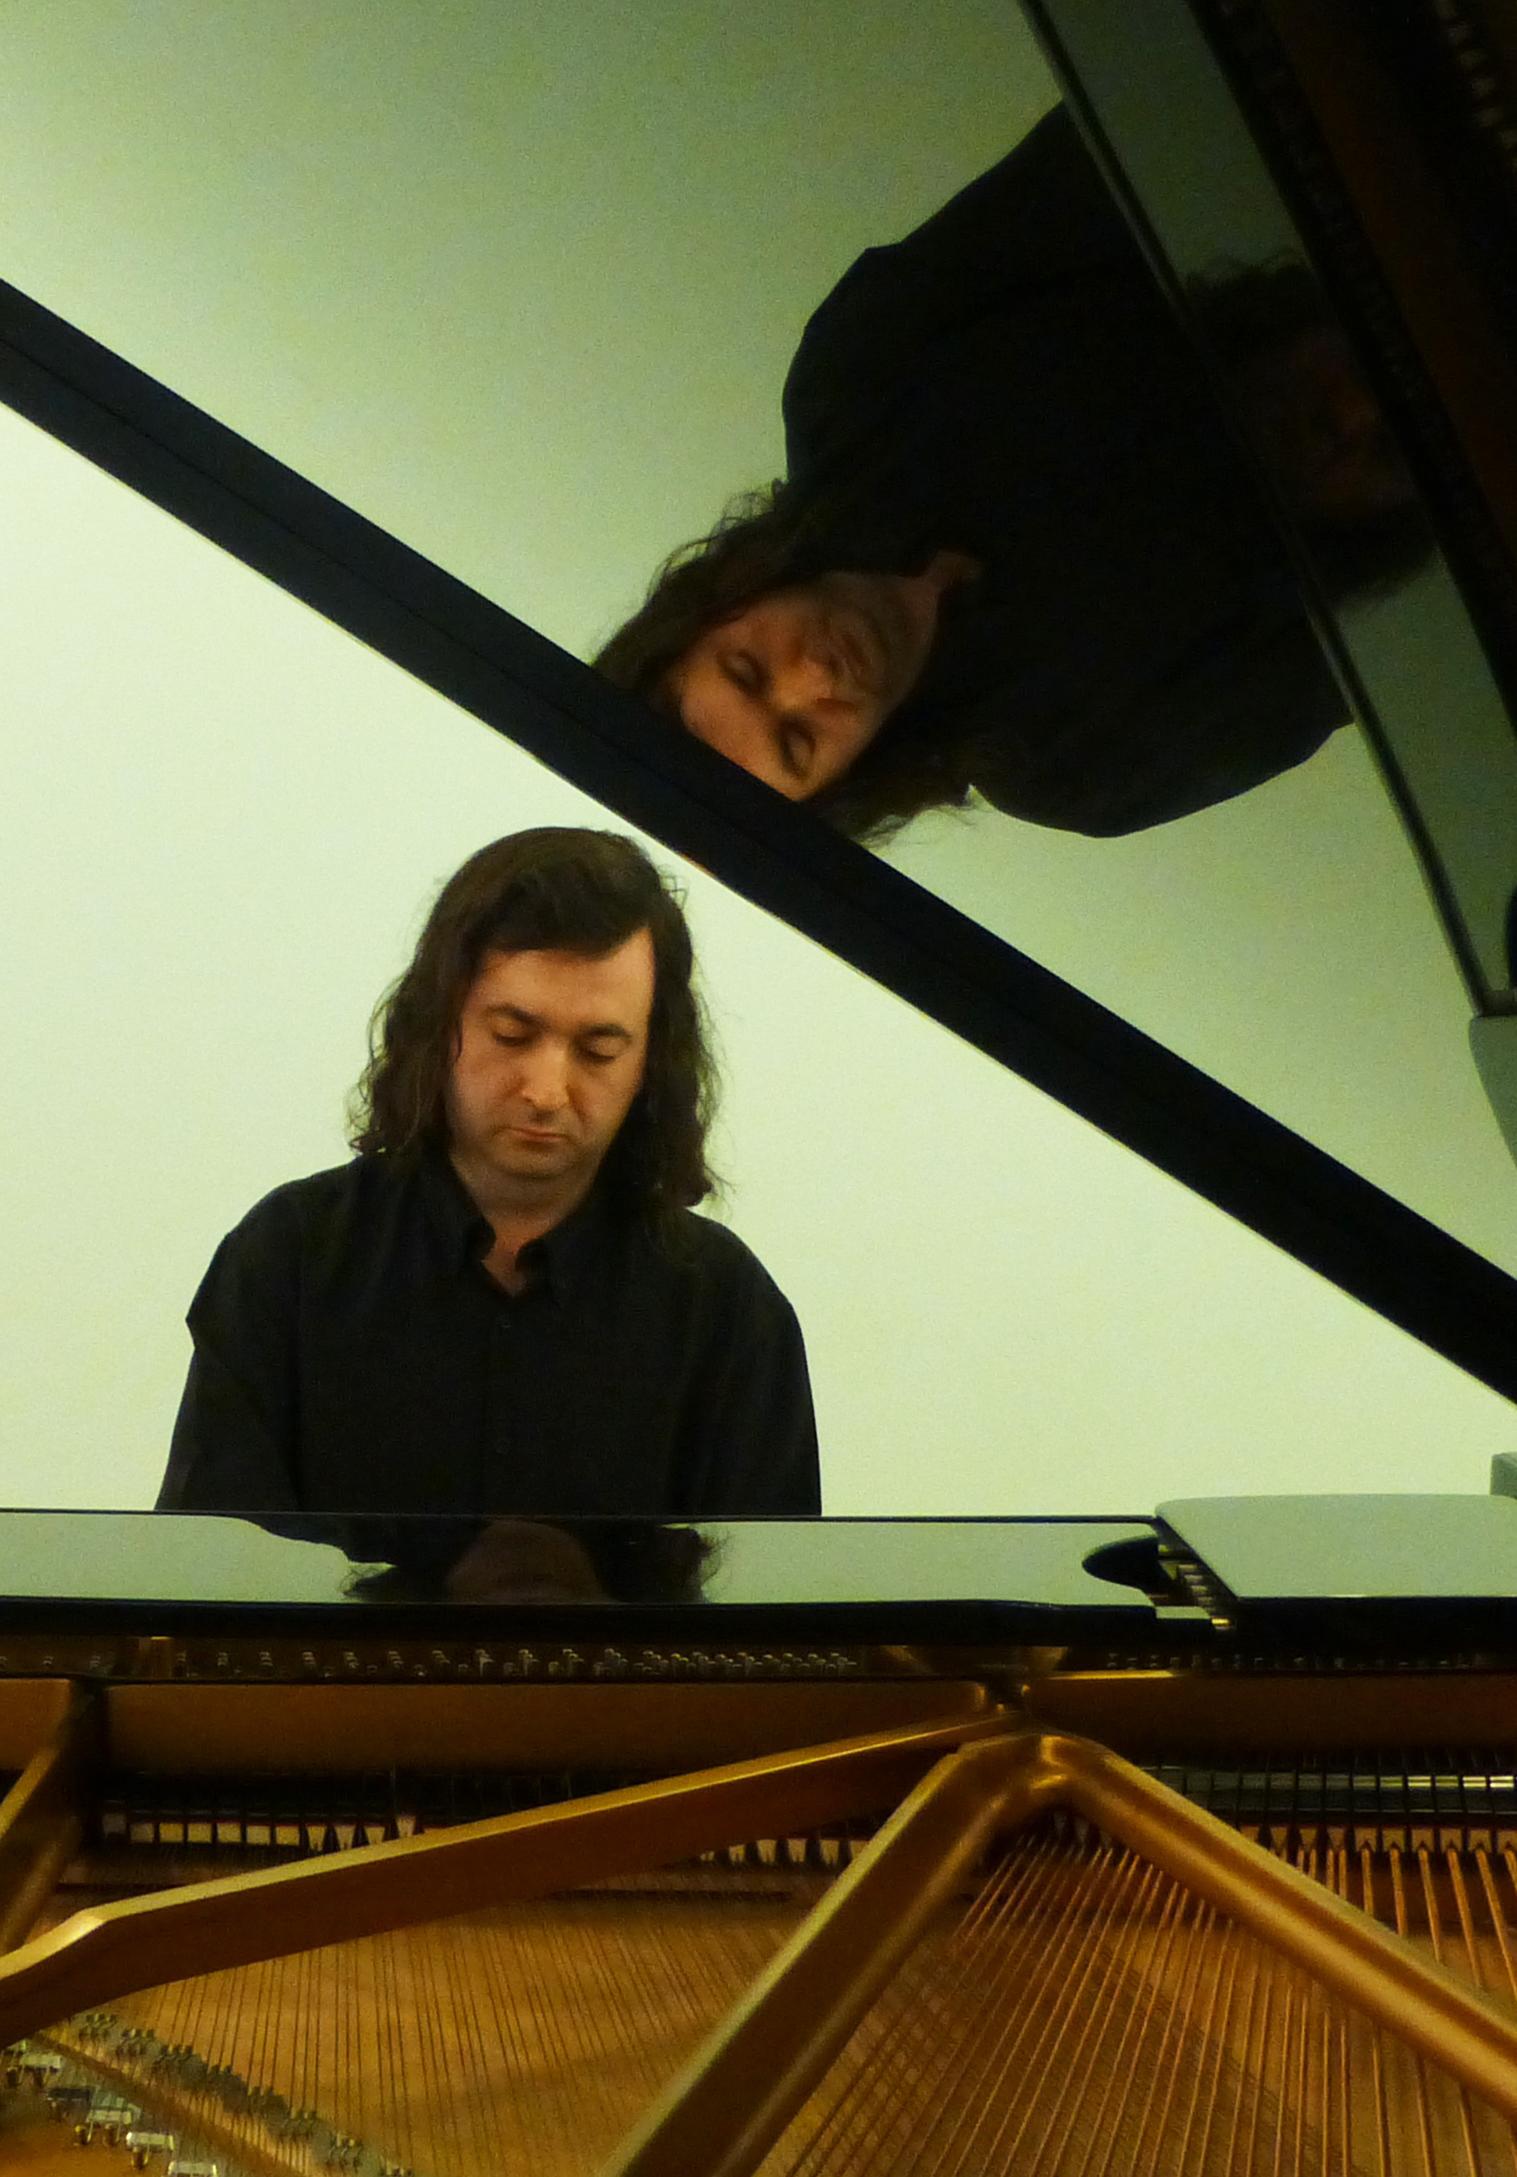 Abel Sánchez-Aguilera